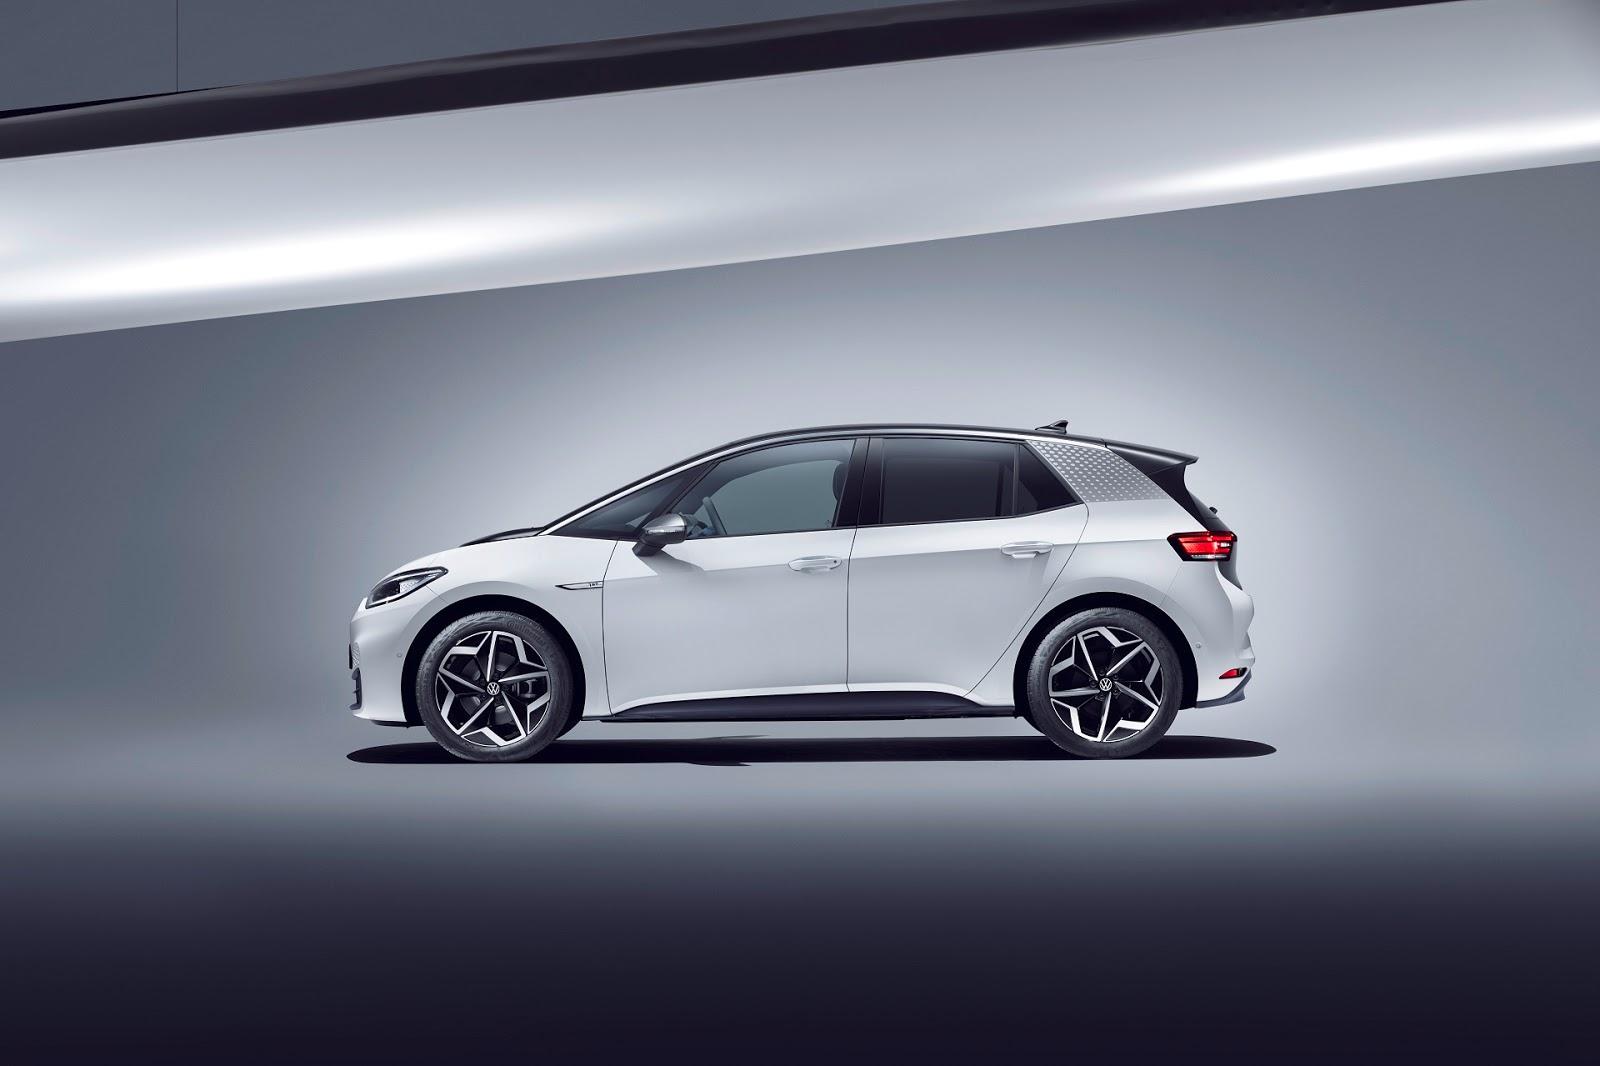 VOLKSWAGEN2BID.3 4 Γιατί το φθηνό ηλεκτρικό της Volkswagen αλλάζει την αυτοκίνηση Volkswagen, zblog, καινούργιο, καινούρια, καινούριο, Τεχνολογία, τιμες, ΦΩΤΟ, φωτογραφίες